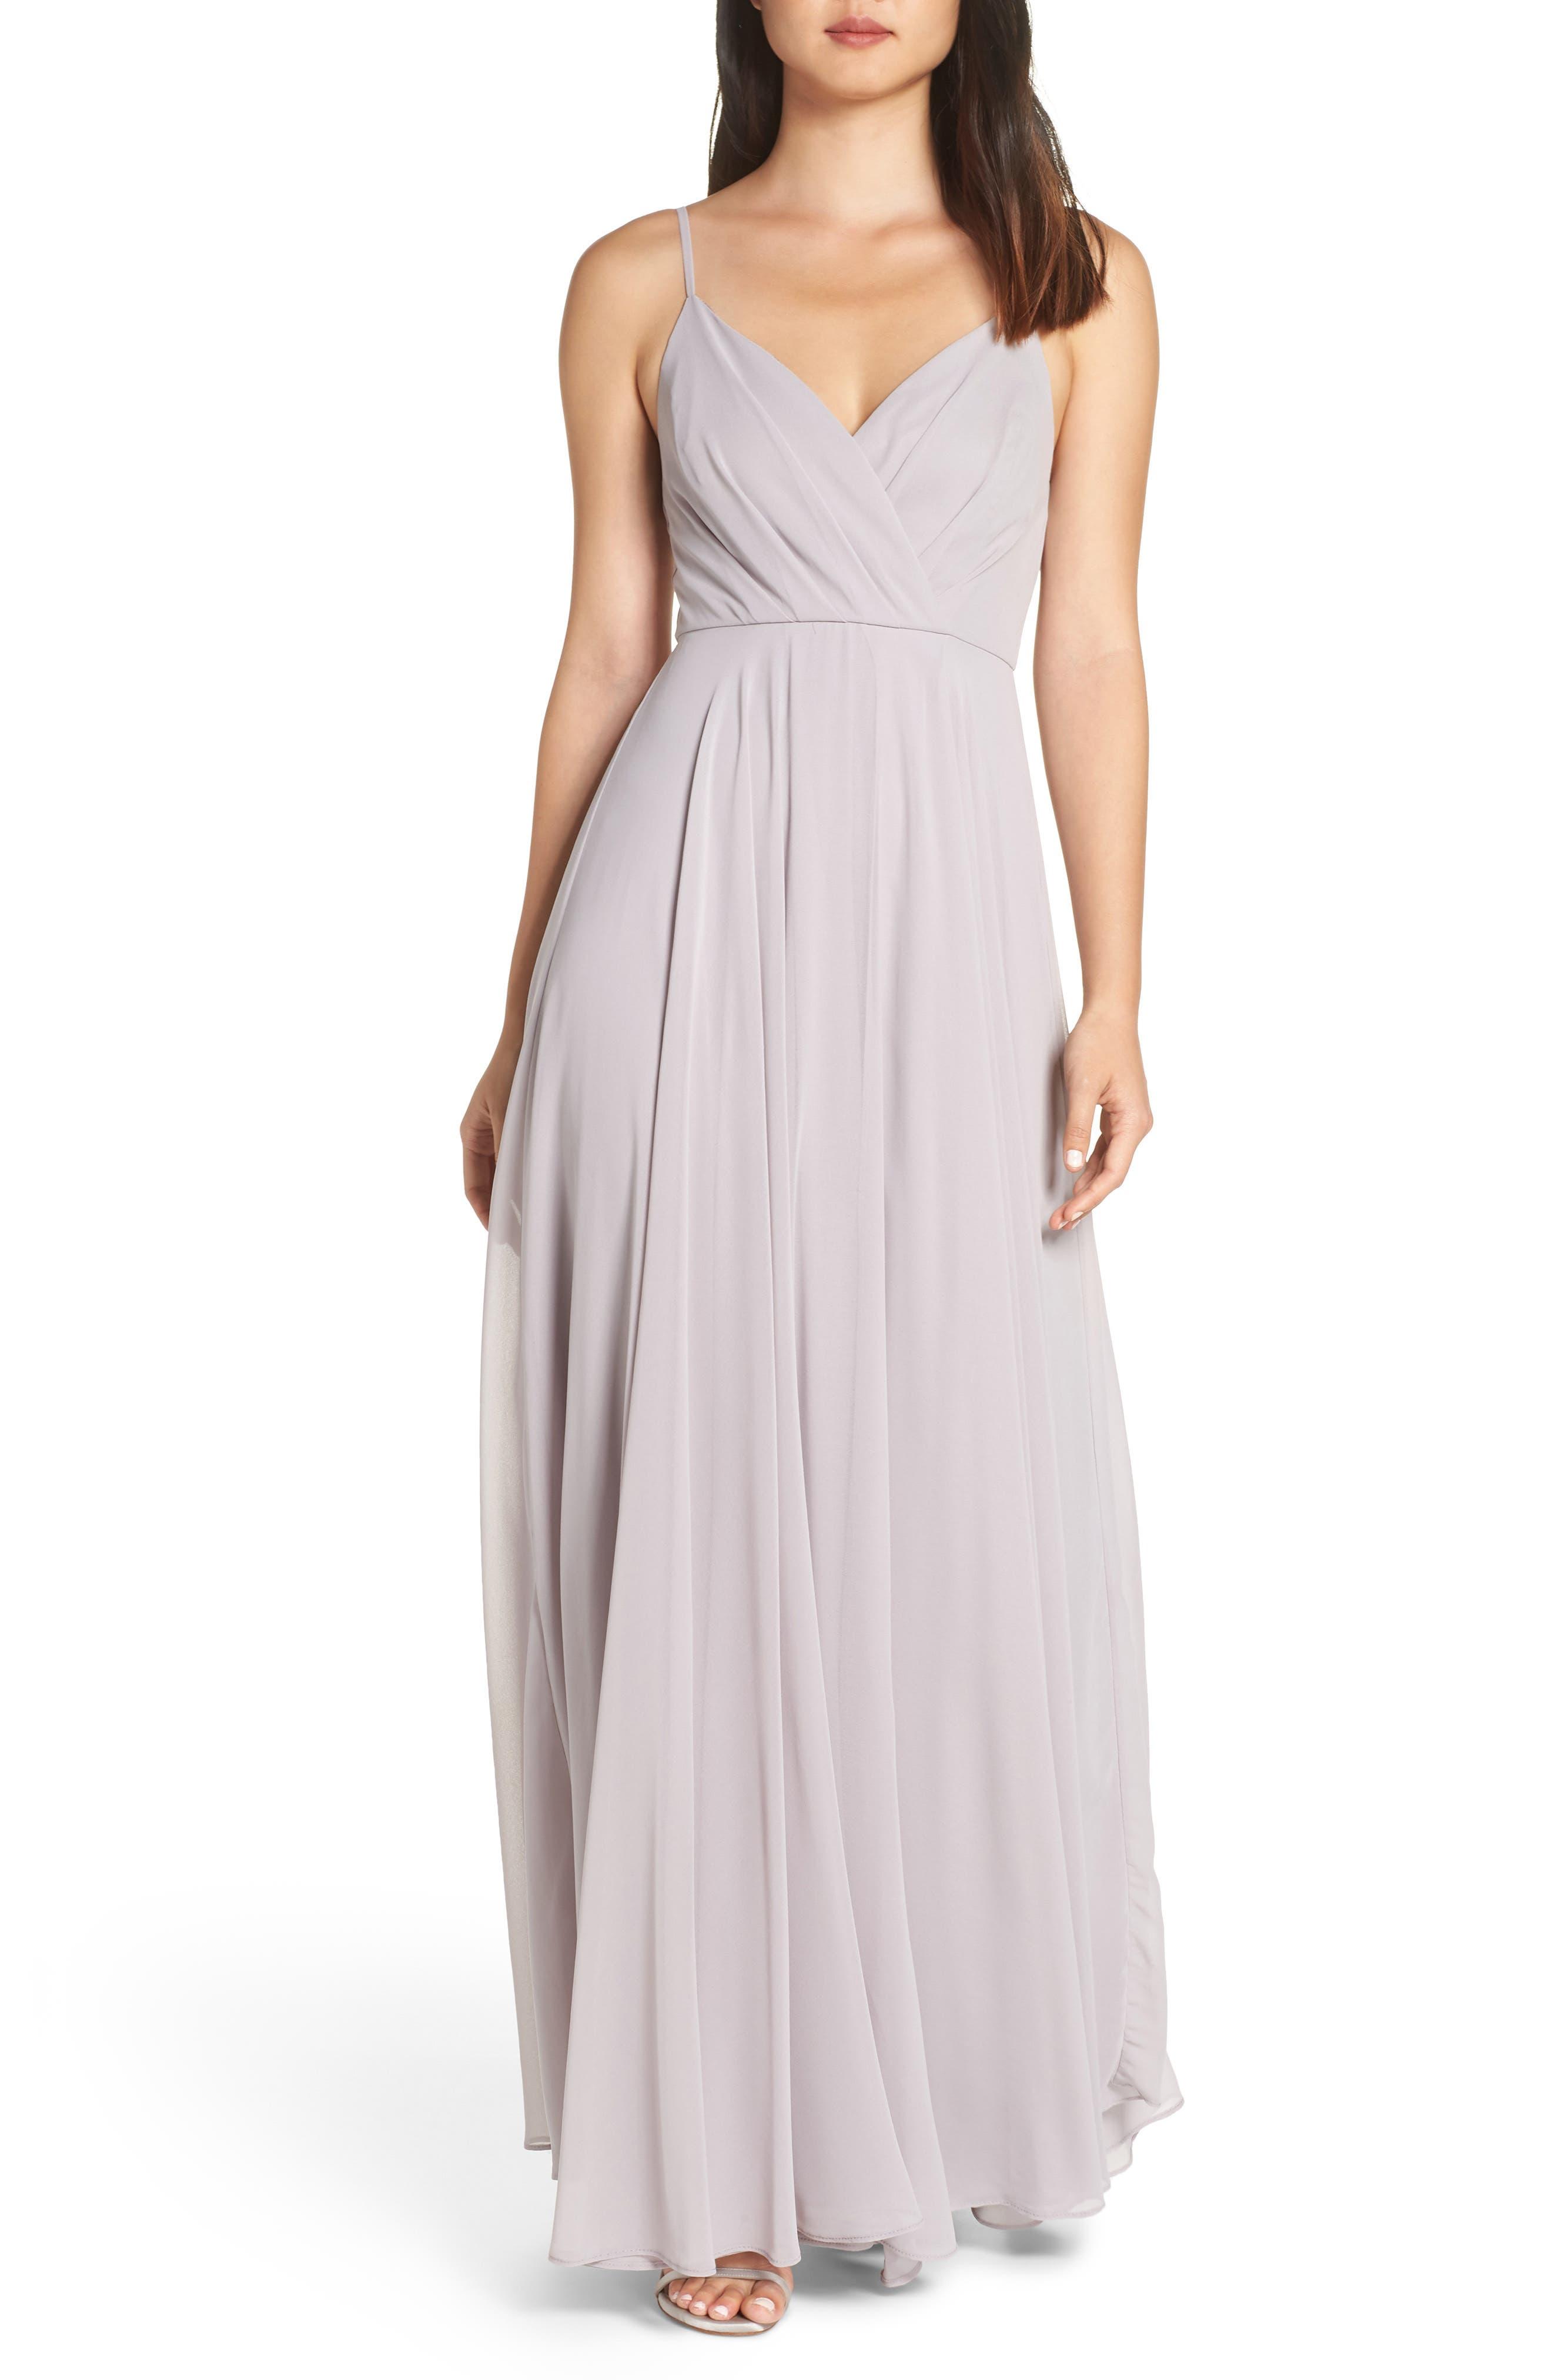 2 Piece Prom Dresses On Sale